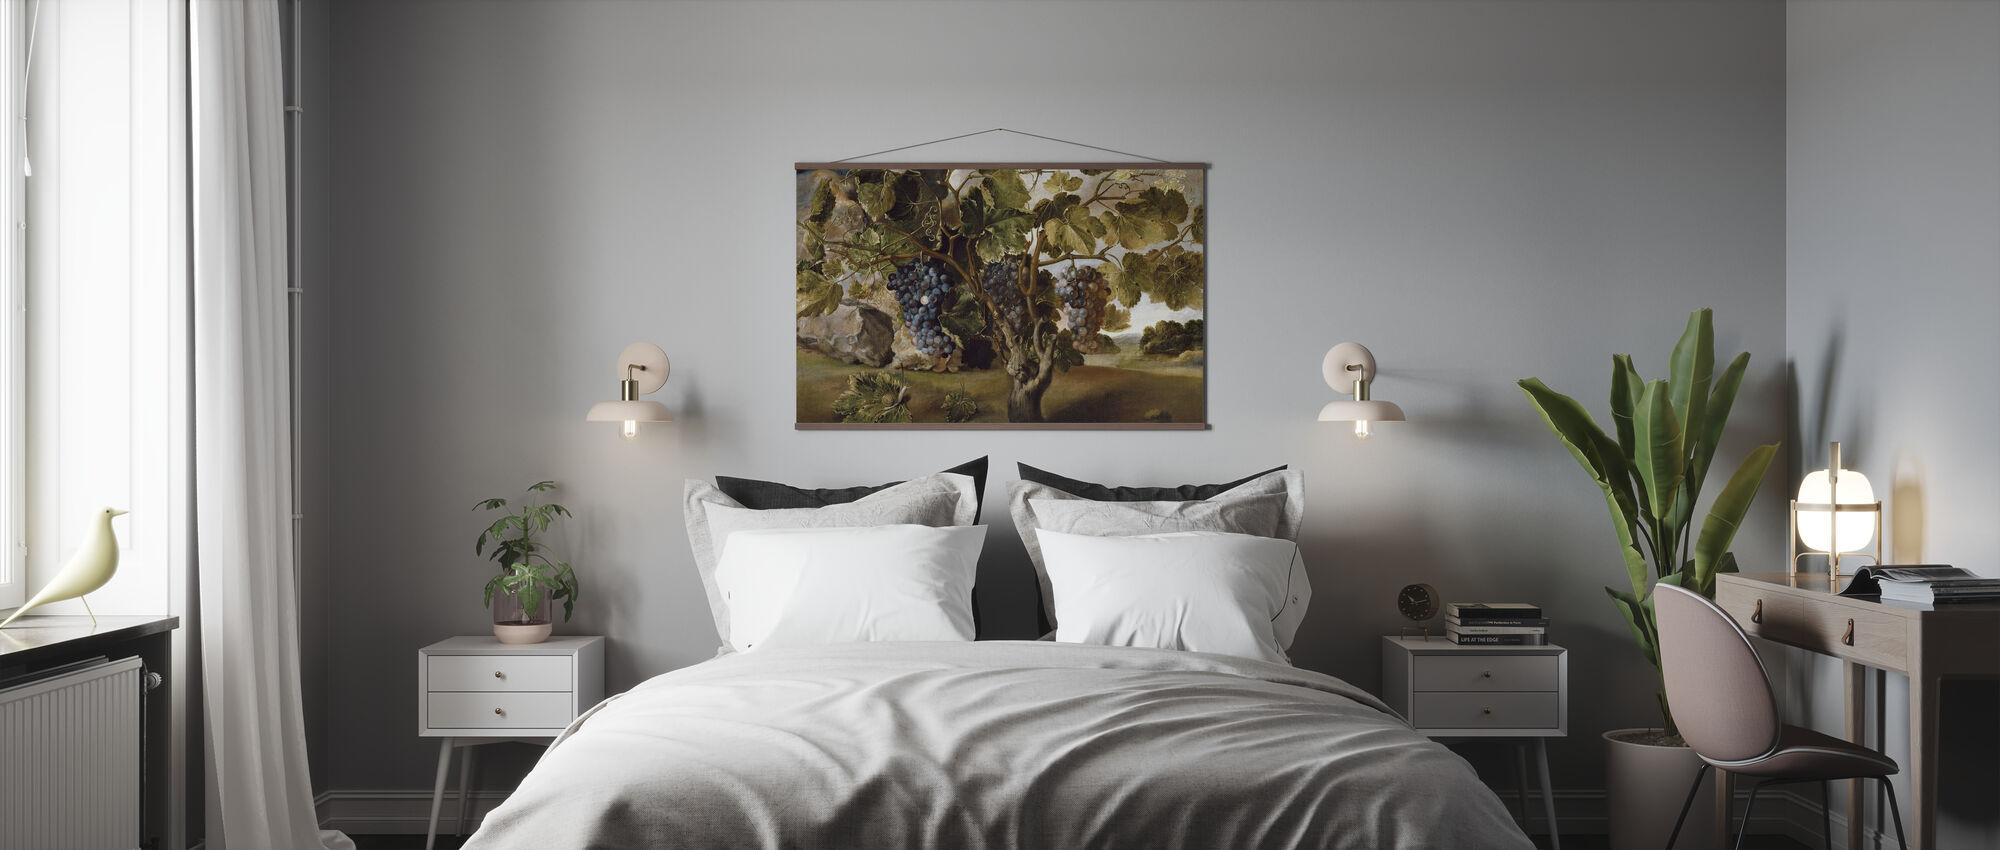 Gravepine - Tomas Hiepes - Poster - Bedroom